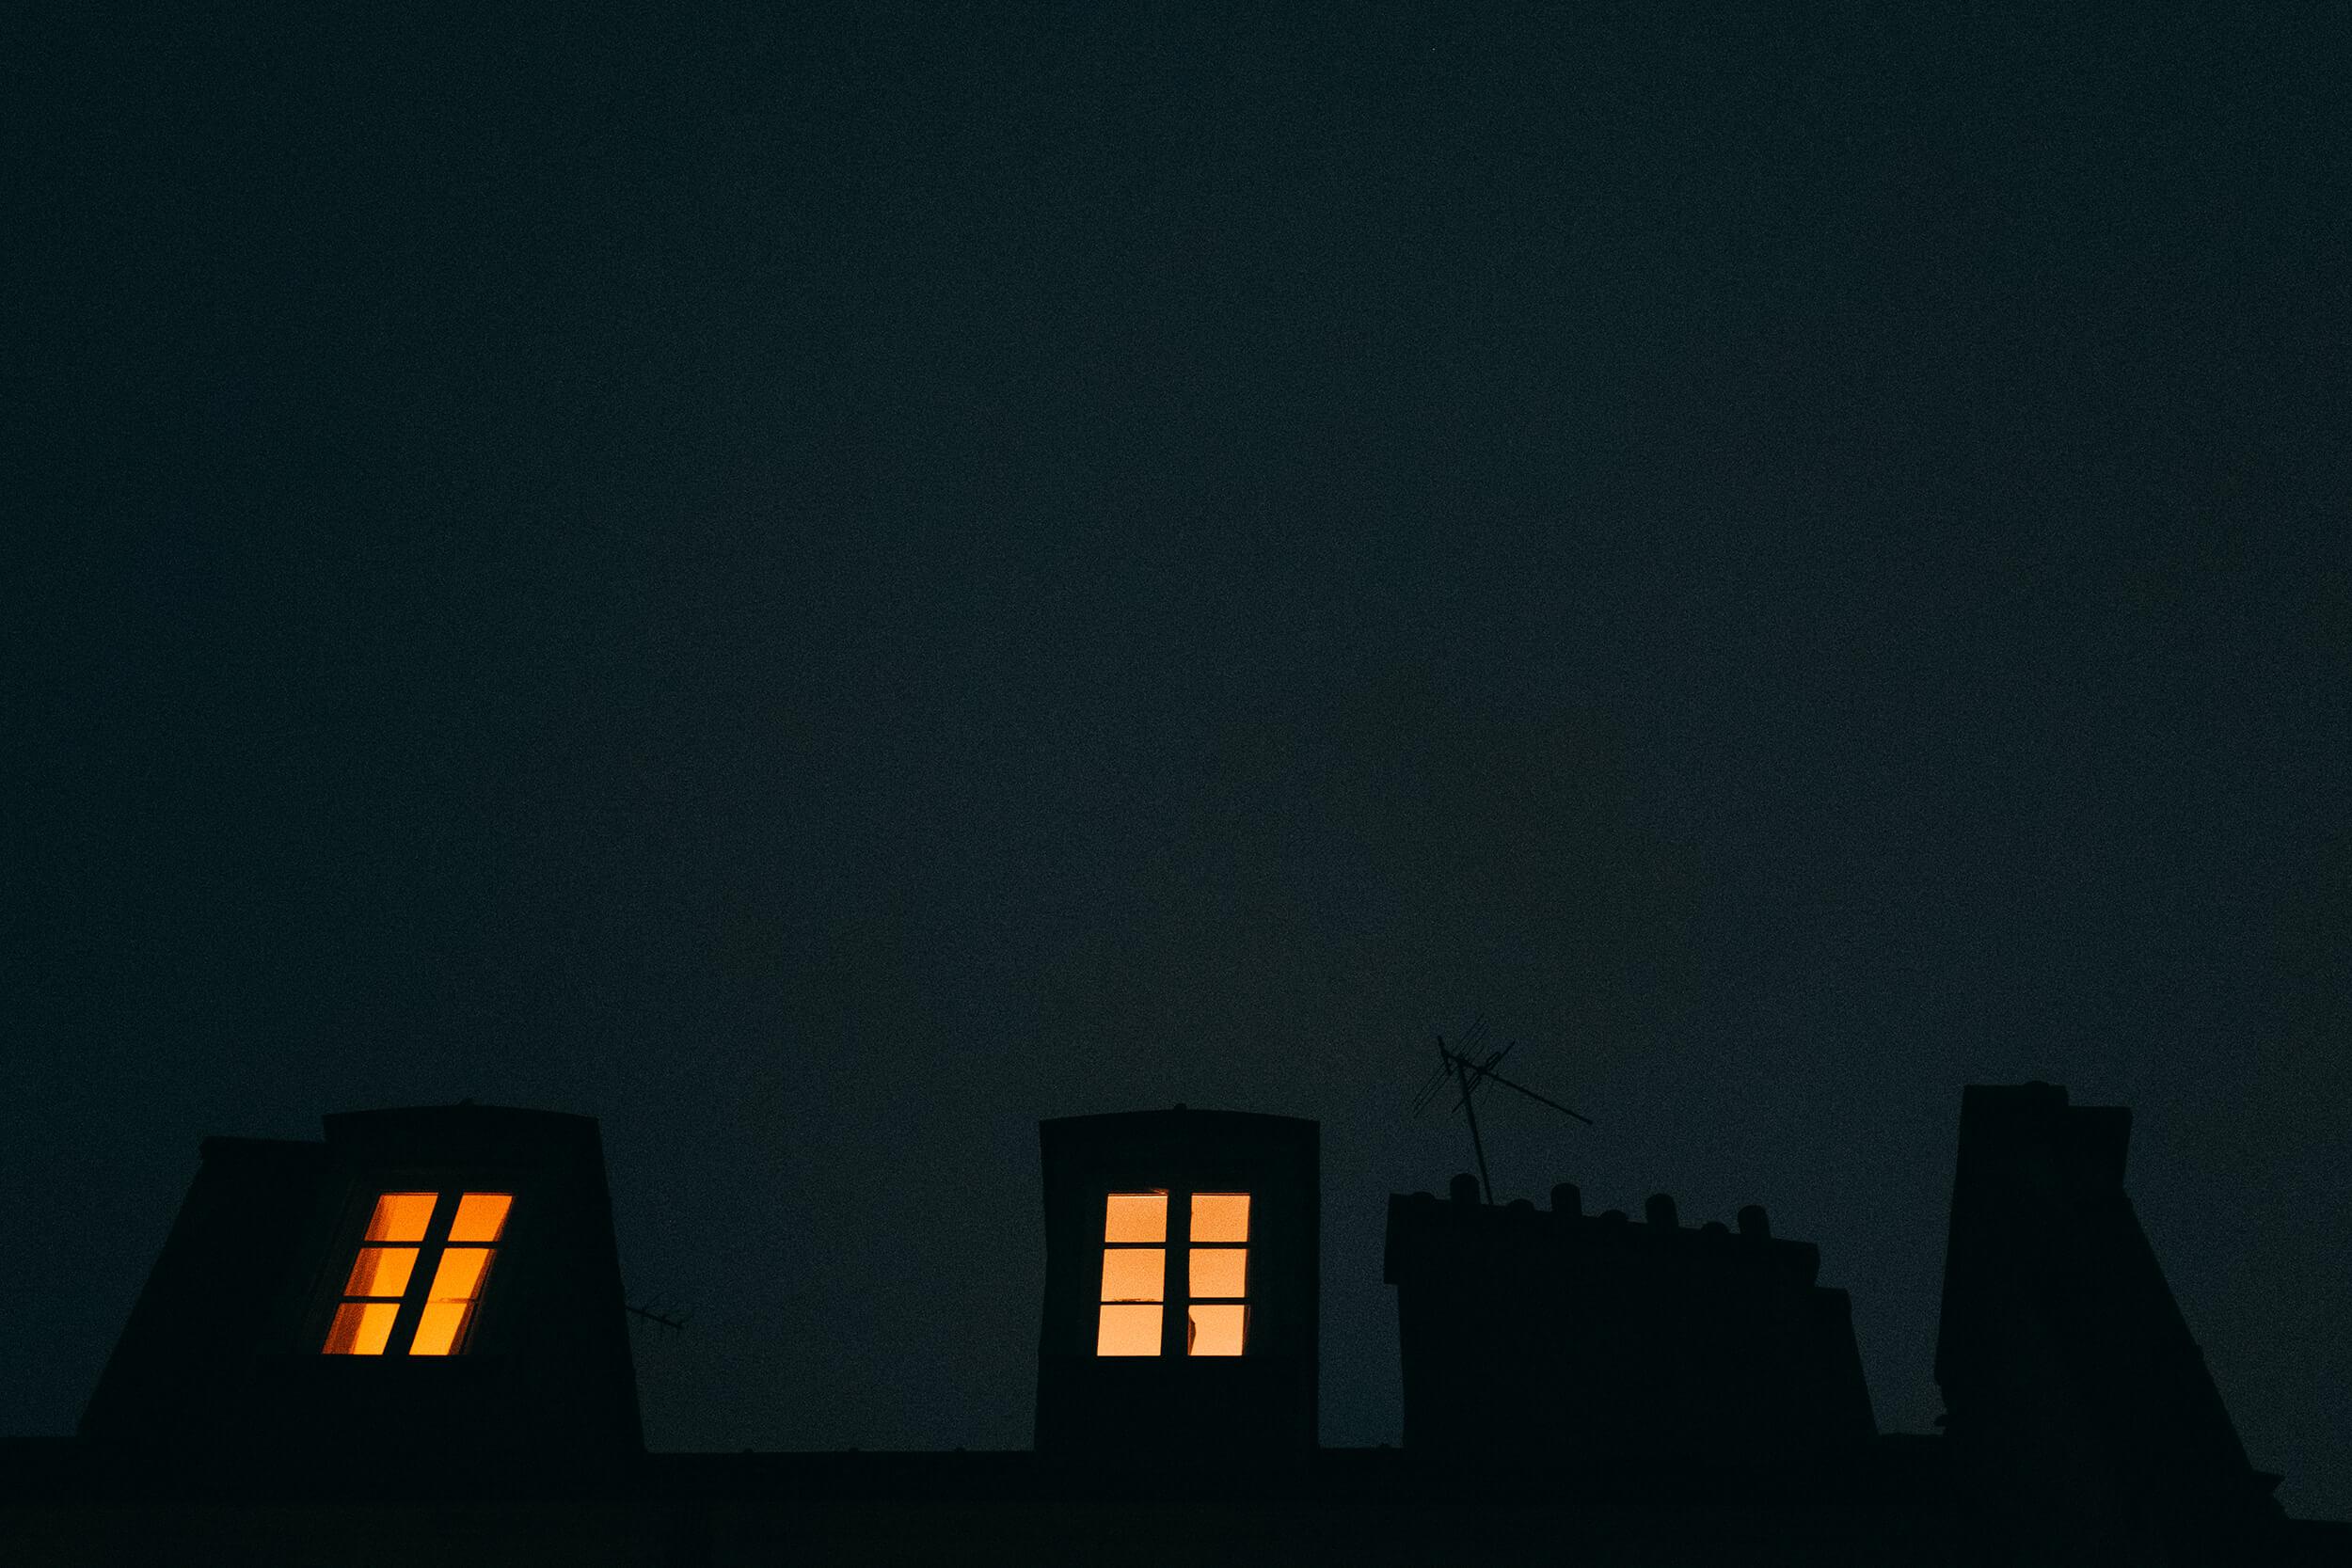 Strangers Windows -